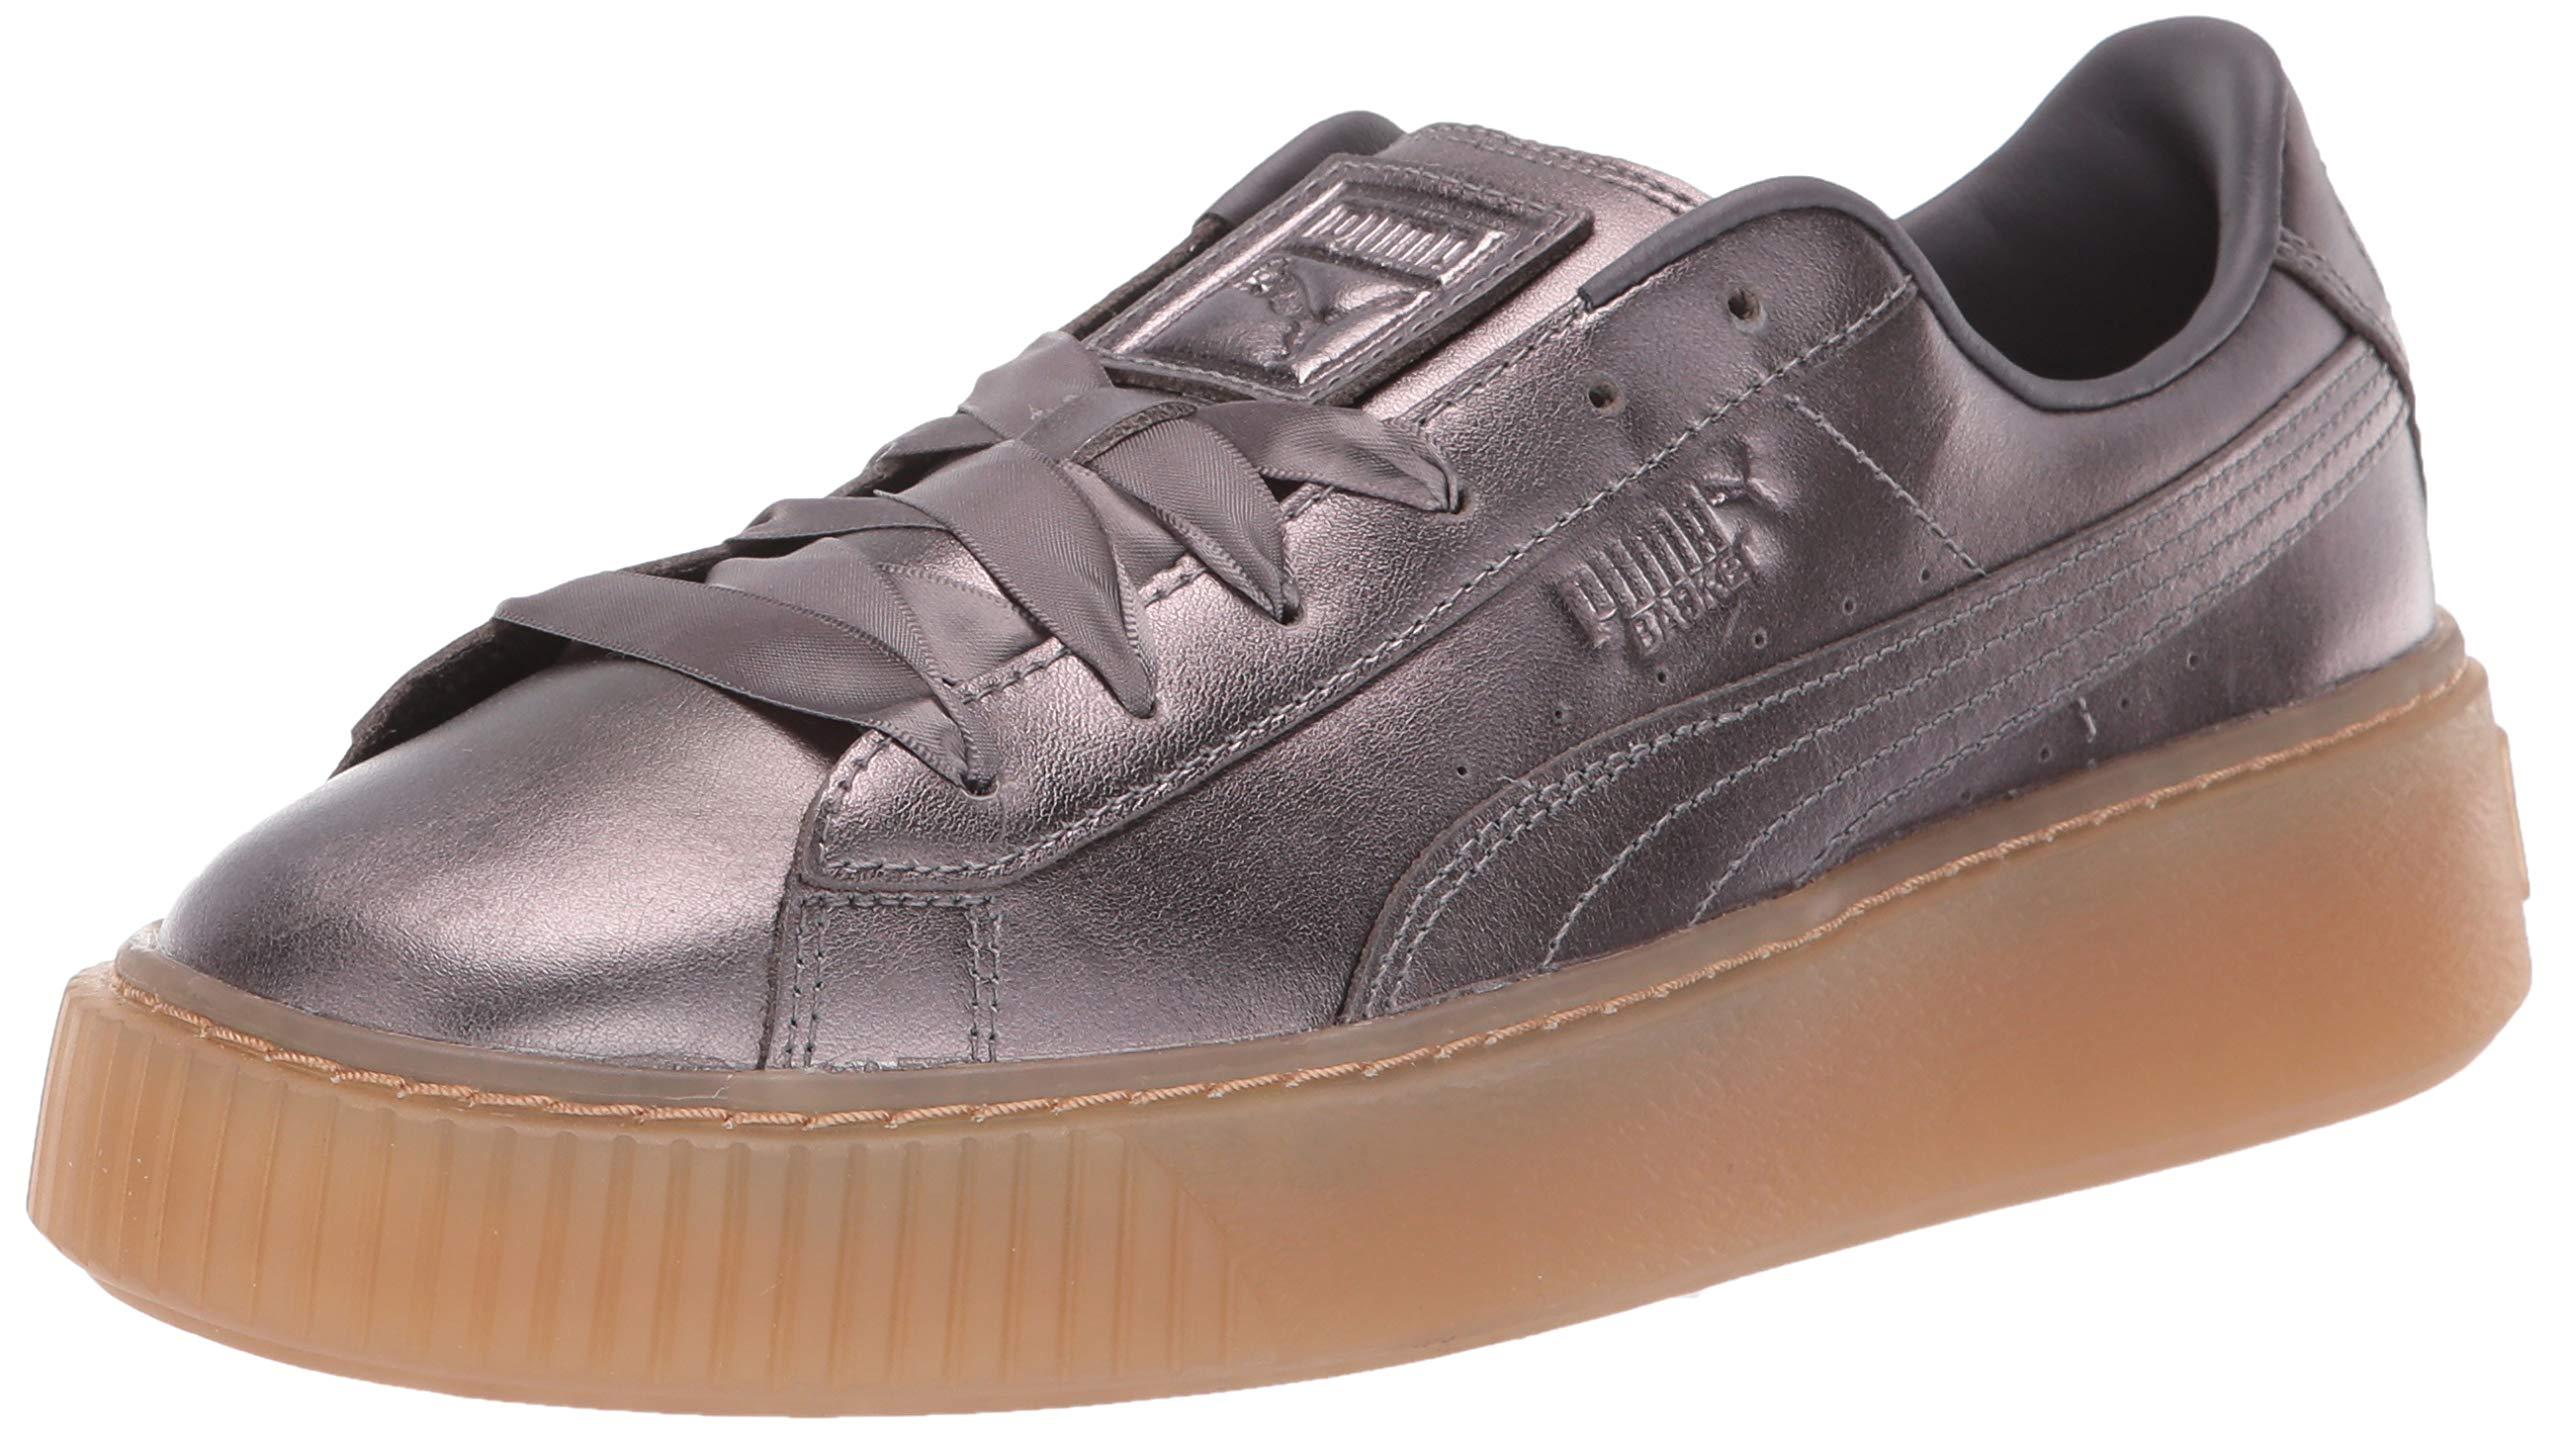 PUMA 女式篮球防水台 时尚运动鞋